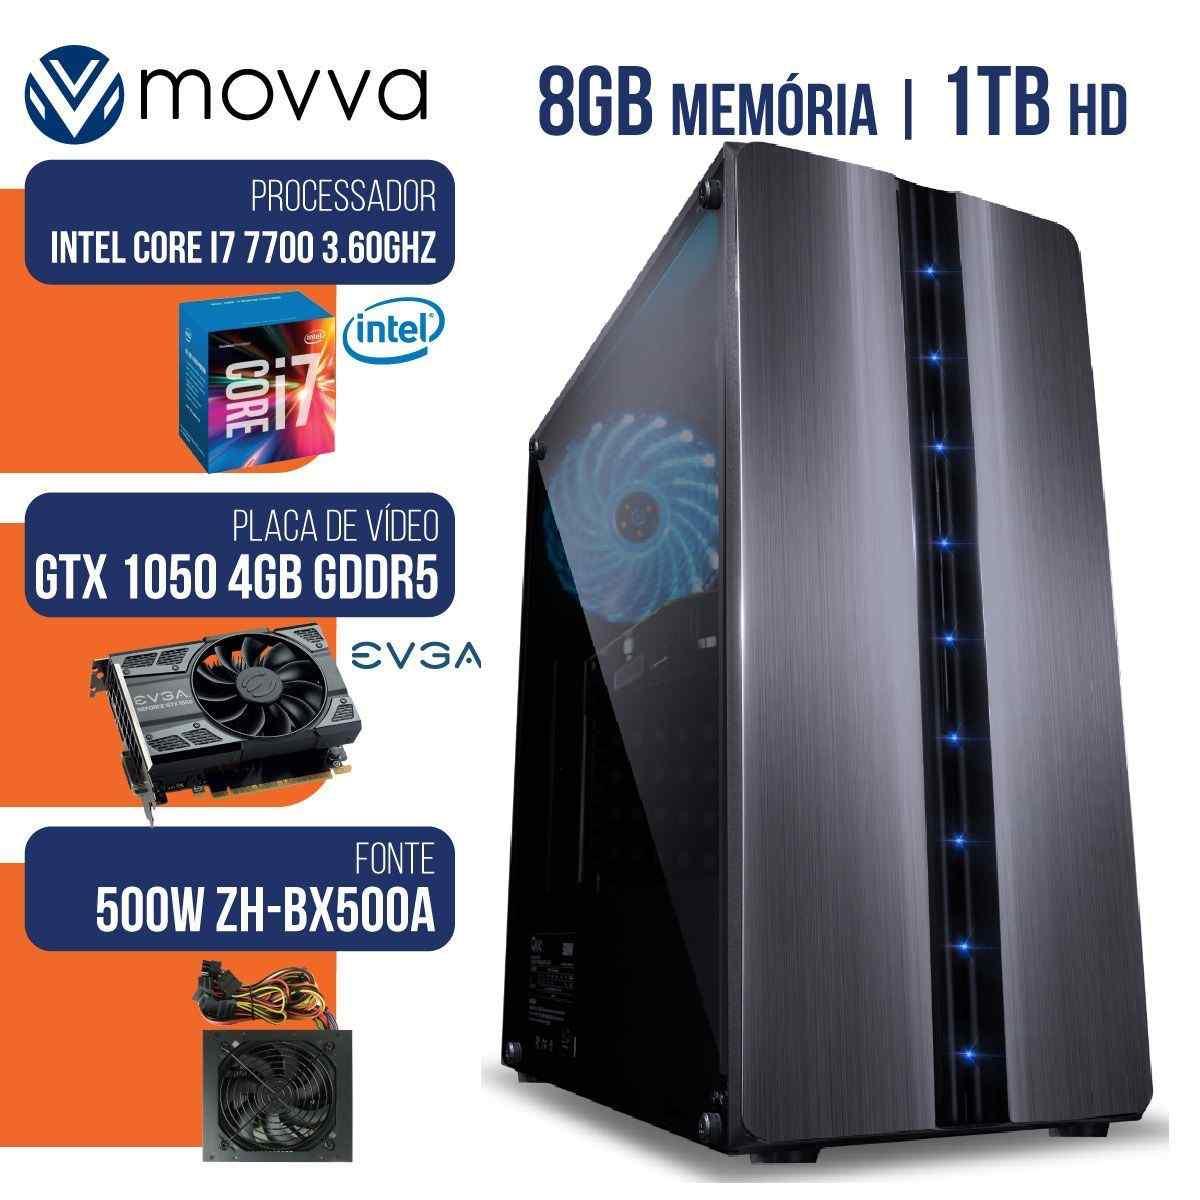 COMPUTADOR GAMER MVX7 INTEL I7 7700 3.6GHZ MEM 8GB HD 1TB HDMI VGA GTX 1050 TI 4GB DDR5 128BITS FONTE 500W LINUX